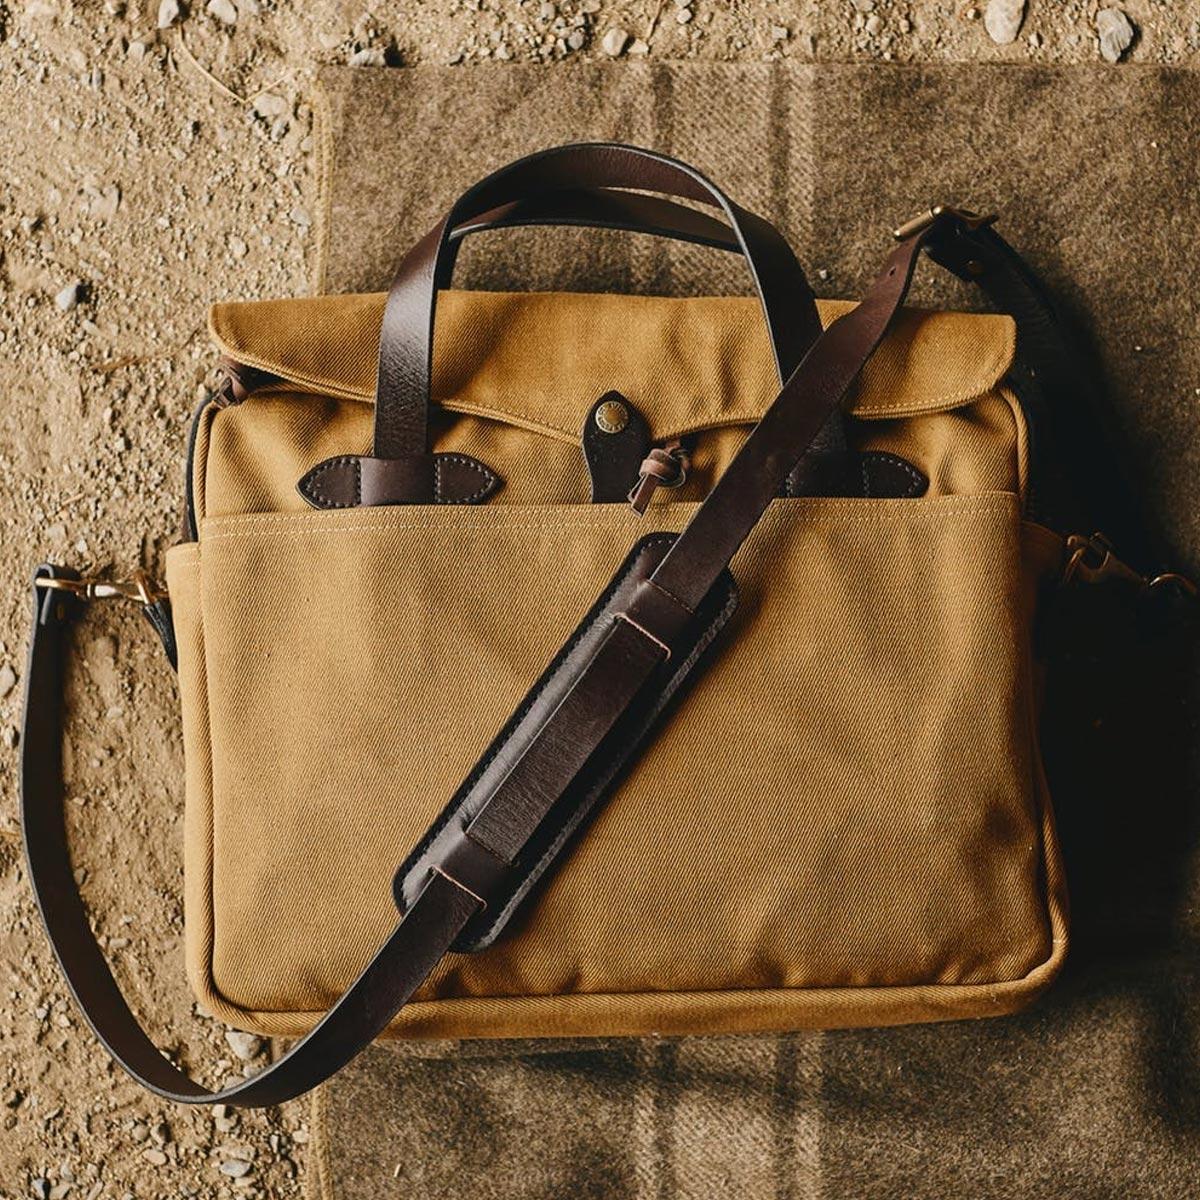 Filson Original Briefcase 11070256 Tan a rugged, vintage inspired, briefcase